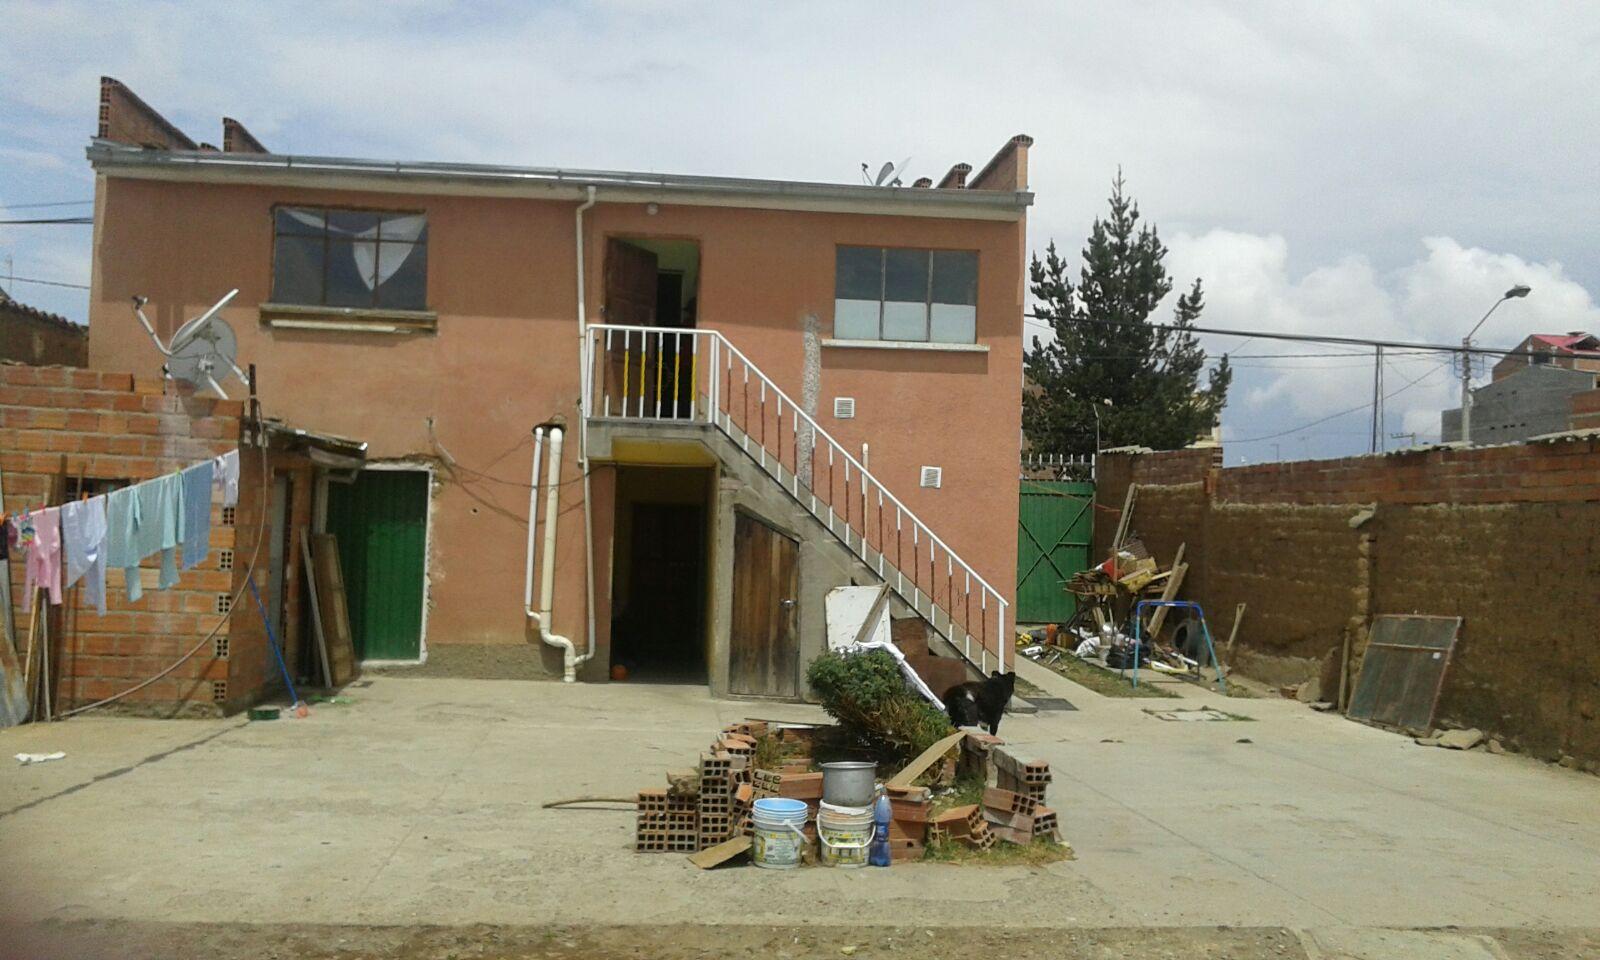 Venta casa la paz la paz bolivia villa adela bolivia for Casas minimalistas la paz bolivia